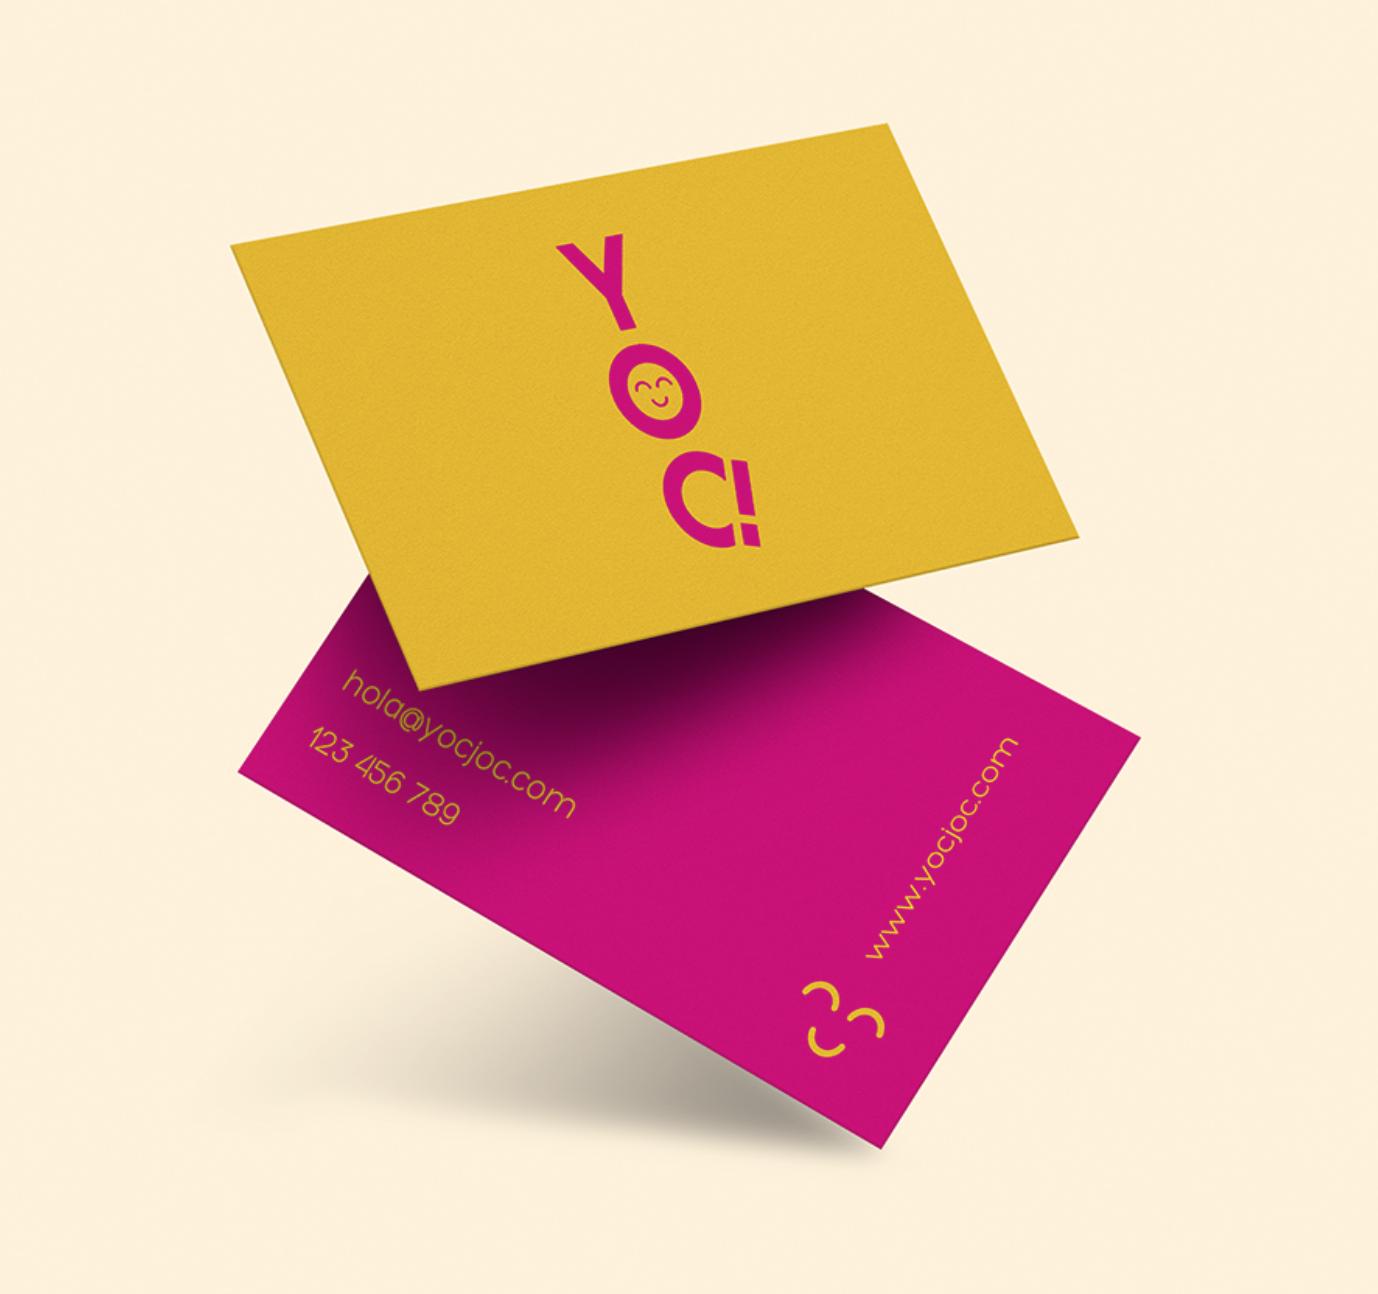 yoc_tarjeta.png